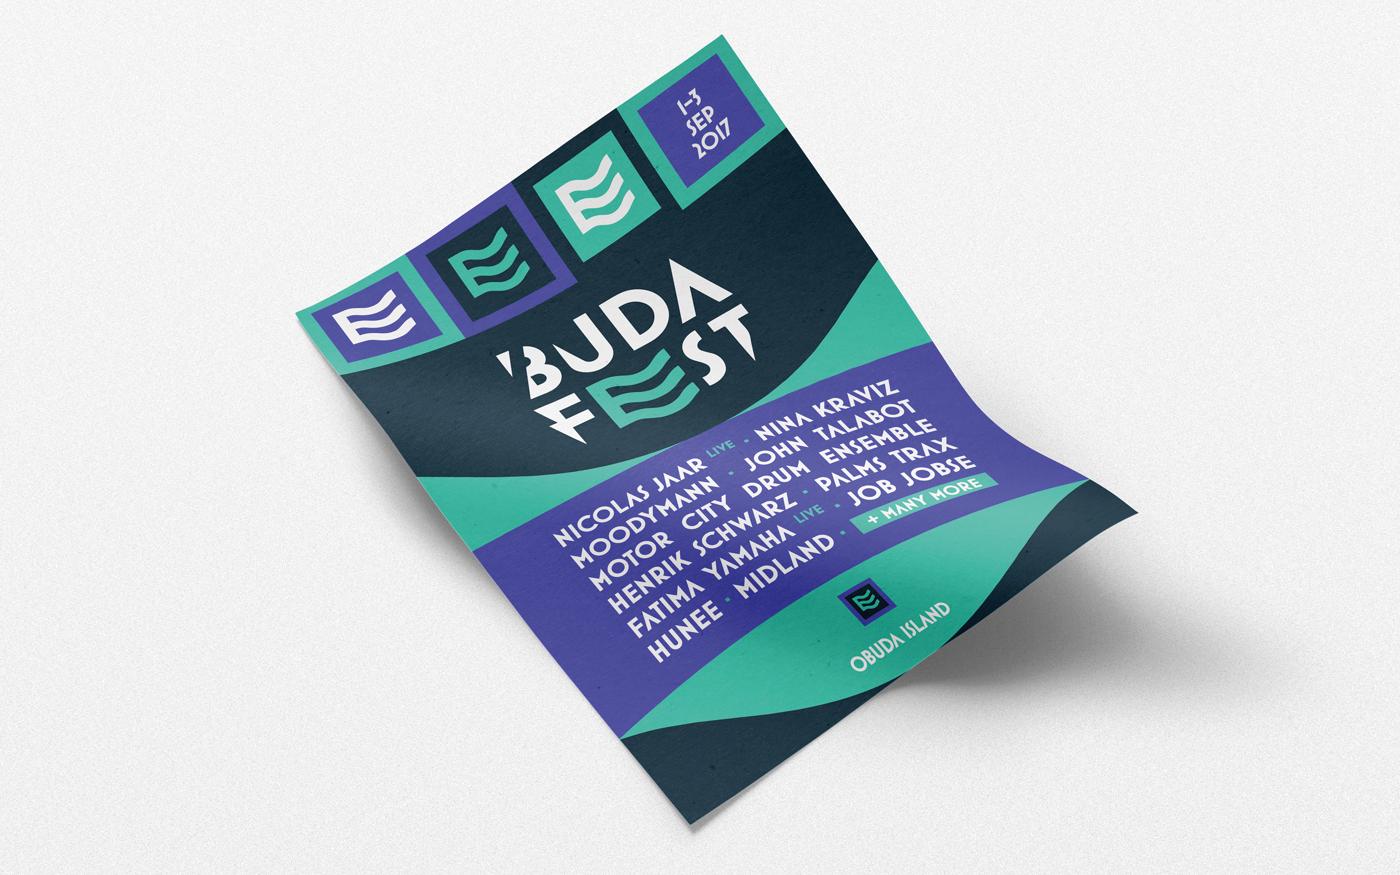 Flyer_Budafest_1400x875